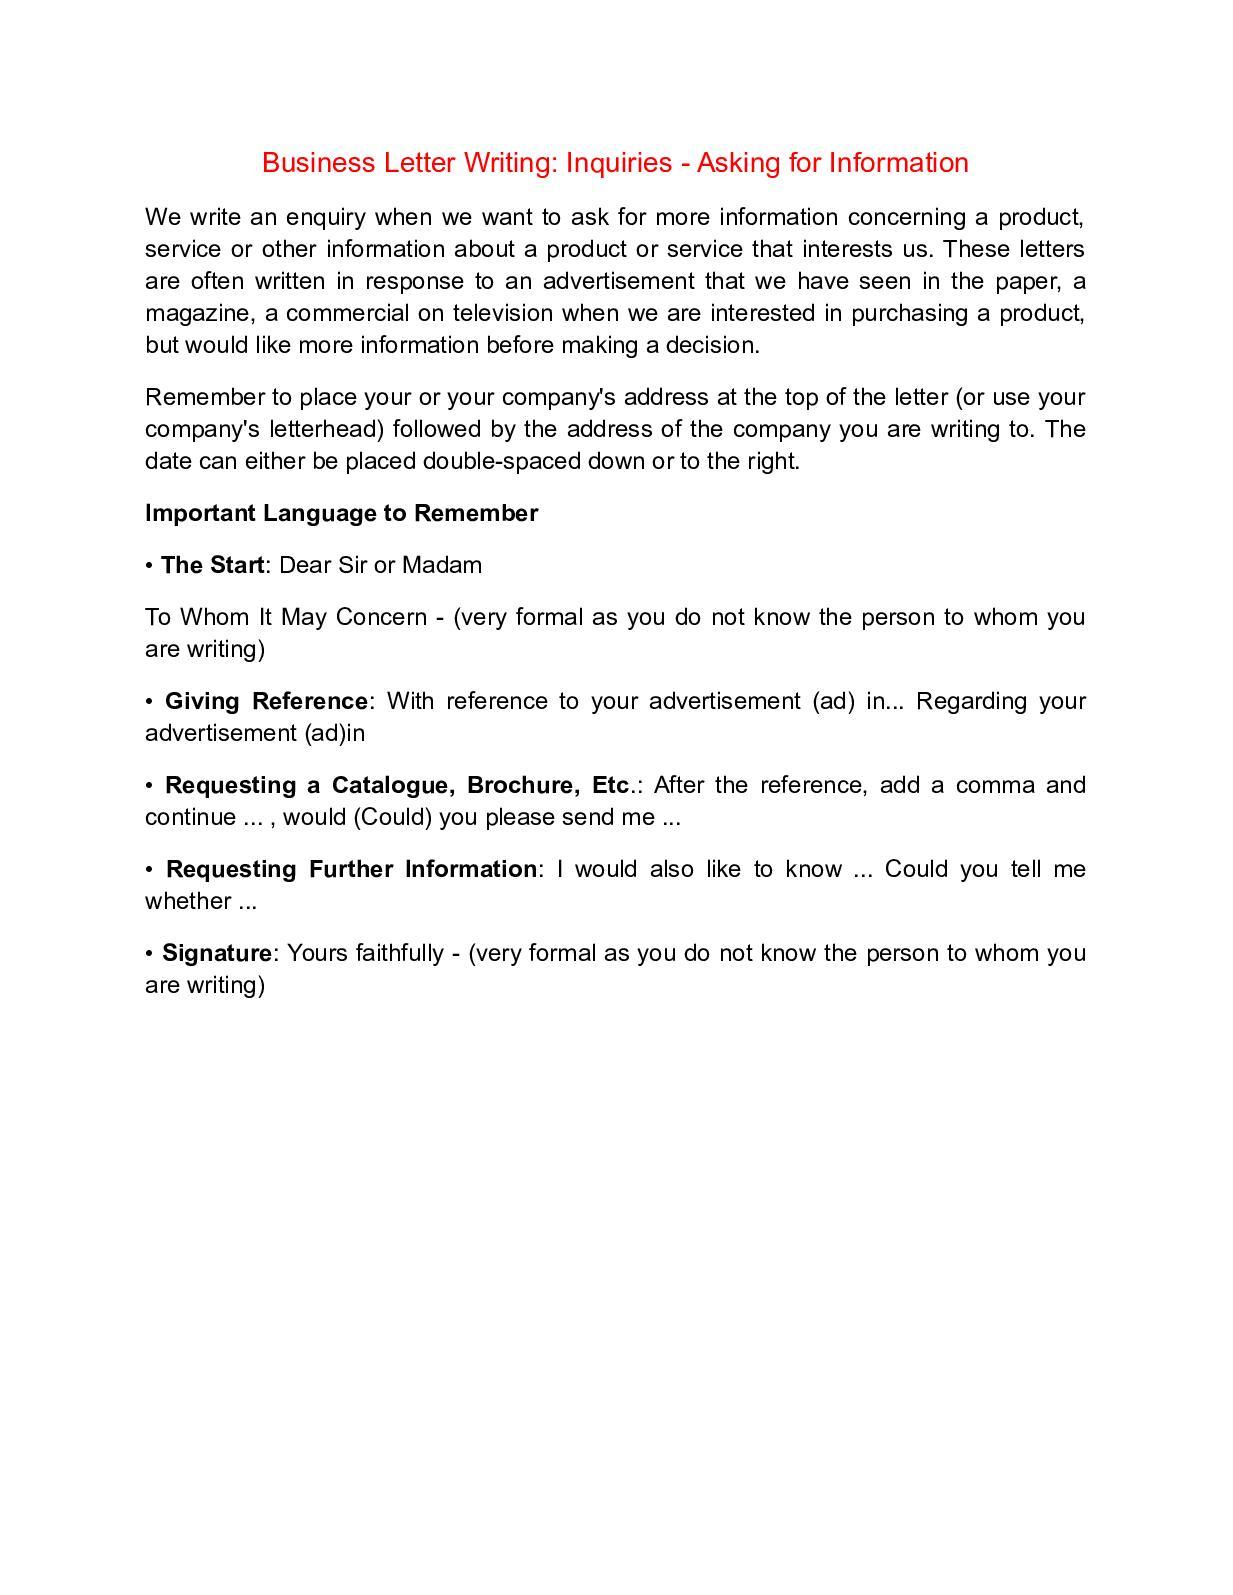 Calamo business letter writing teacher radames castro rivera 203 calamo business letter writing teacher radames castro rivera 203 international traders spiritdancerdesigns Gallery